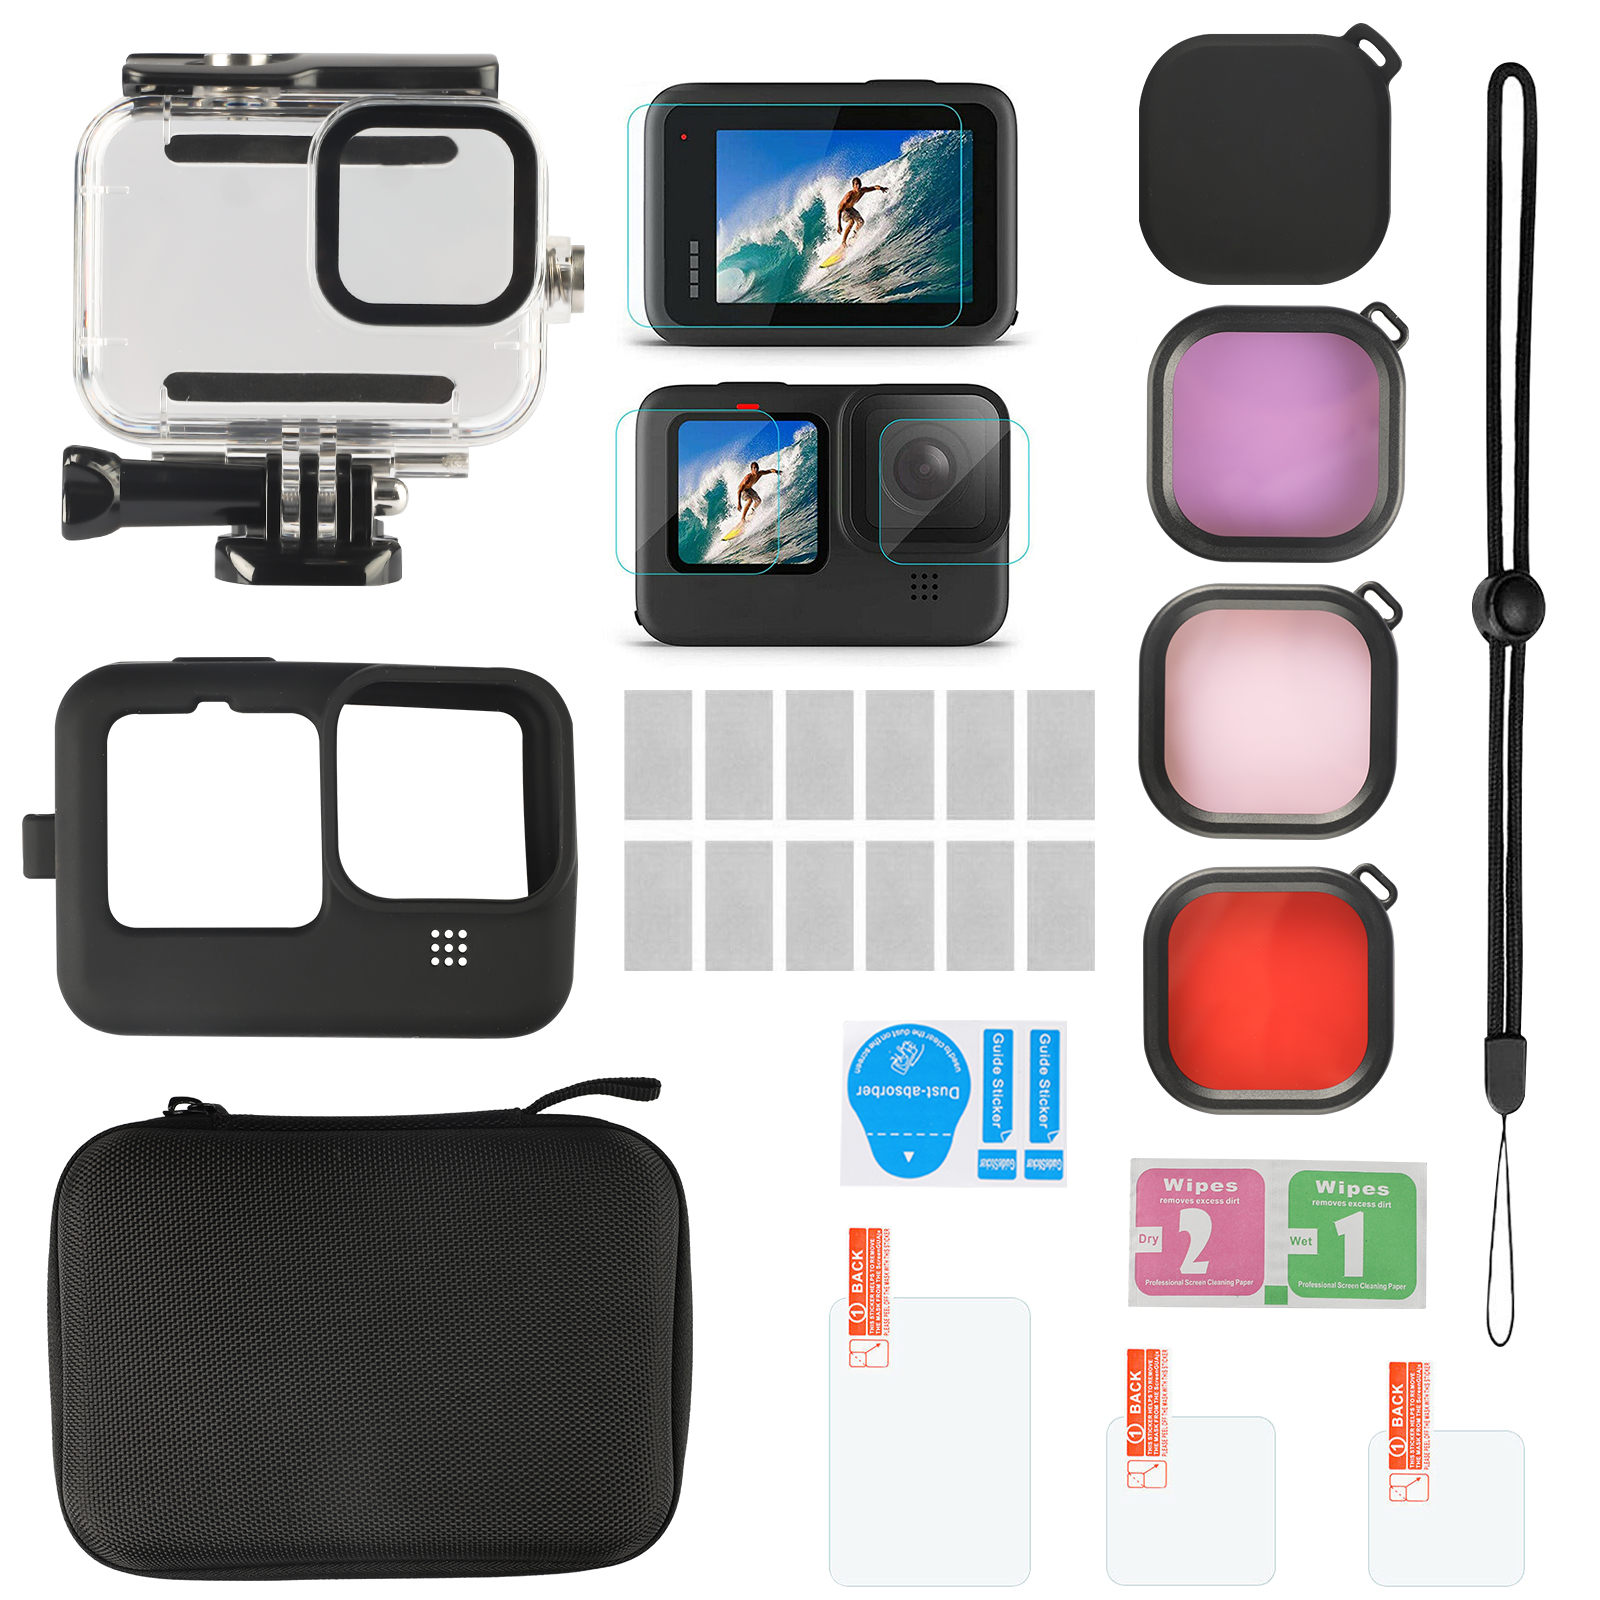 alpha-ene.co.jp VARIPOWDER Accessories Kit for GoPro Hero 9 Black ...